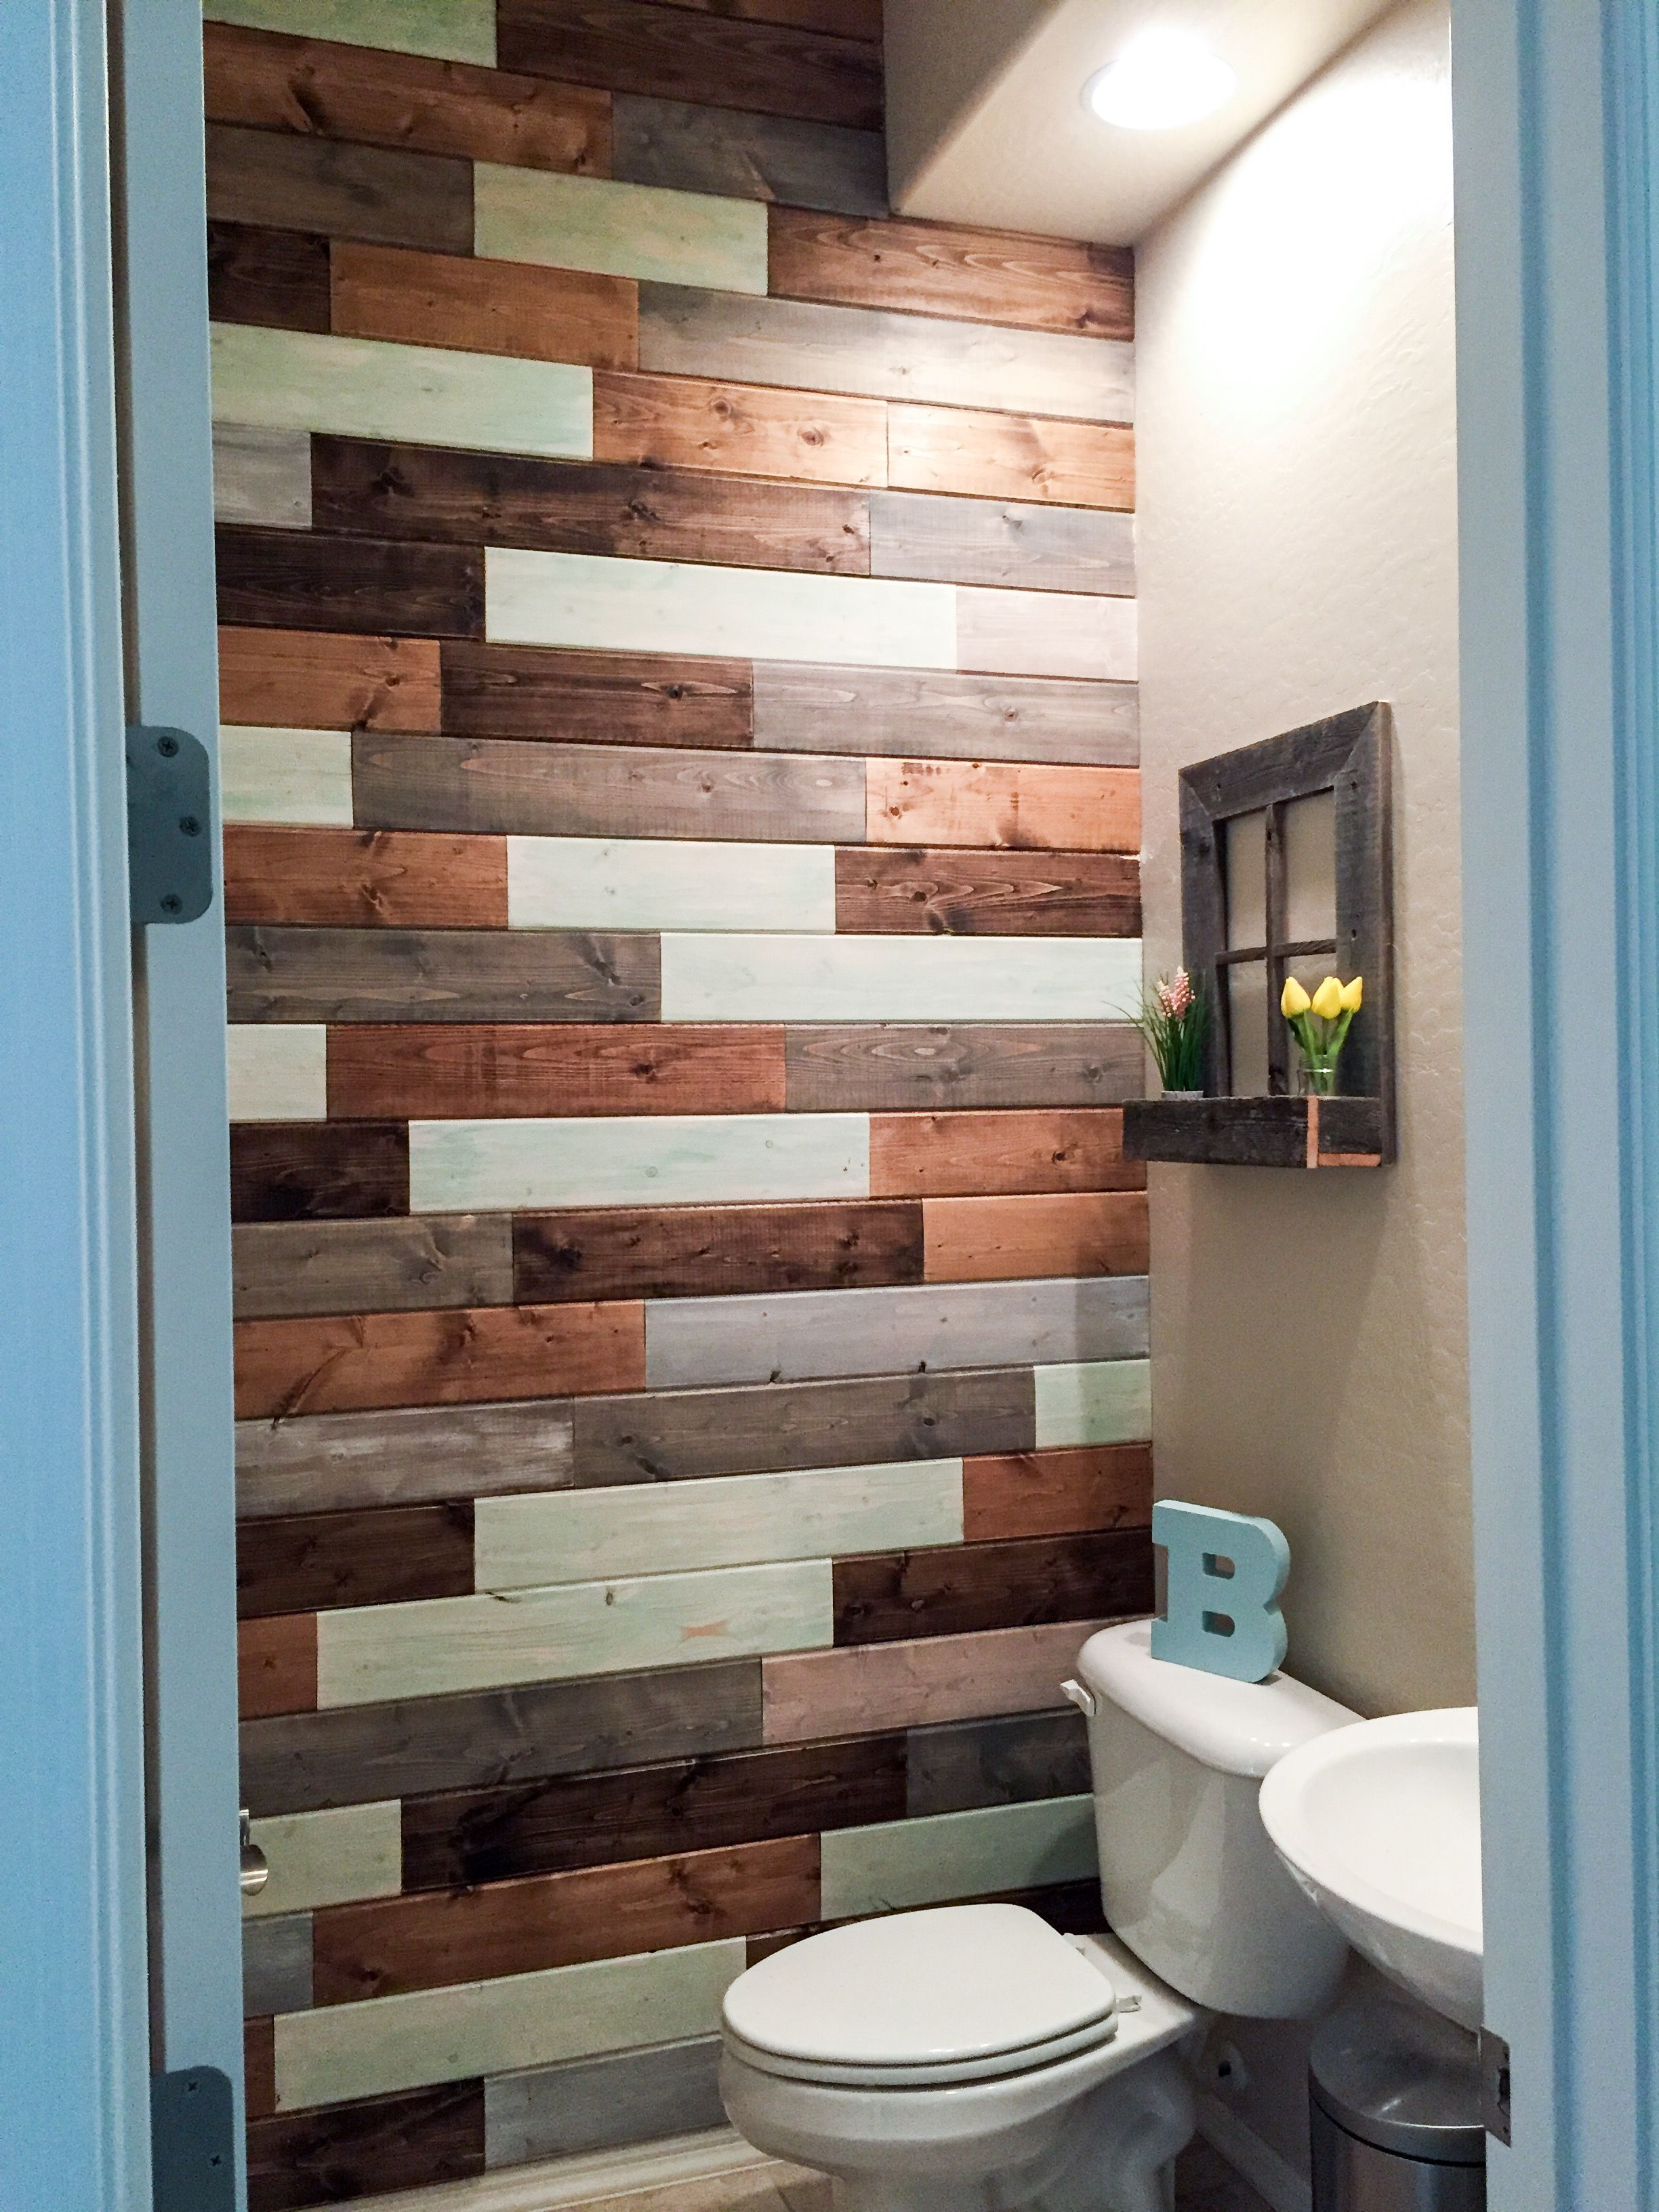 Pin On New House Decor Ideas